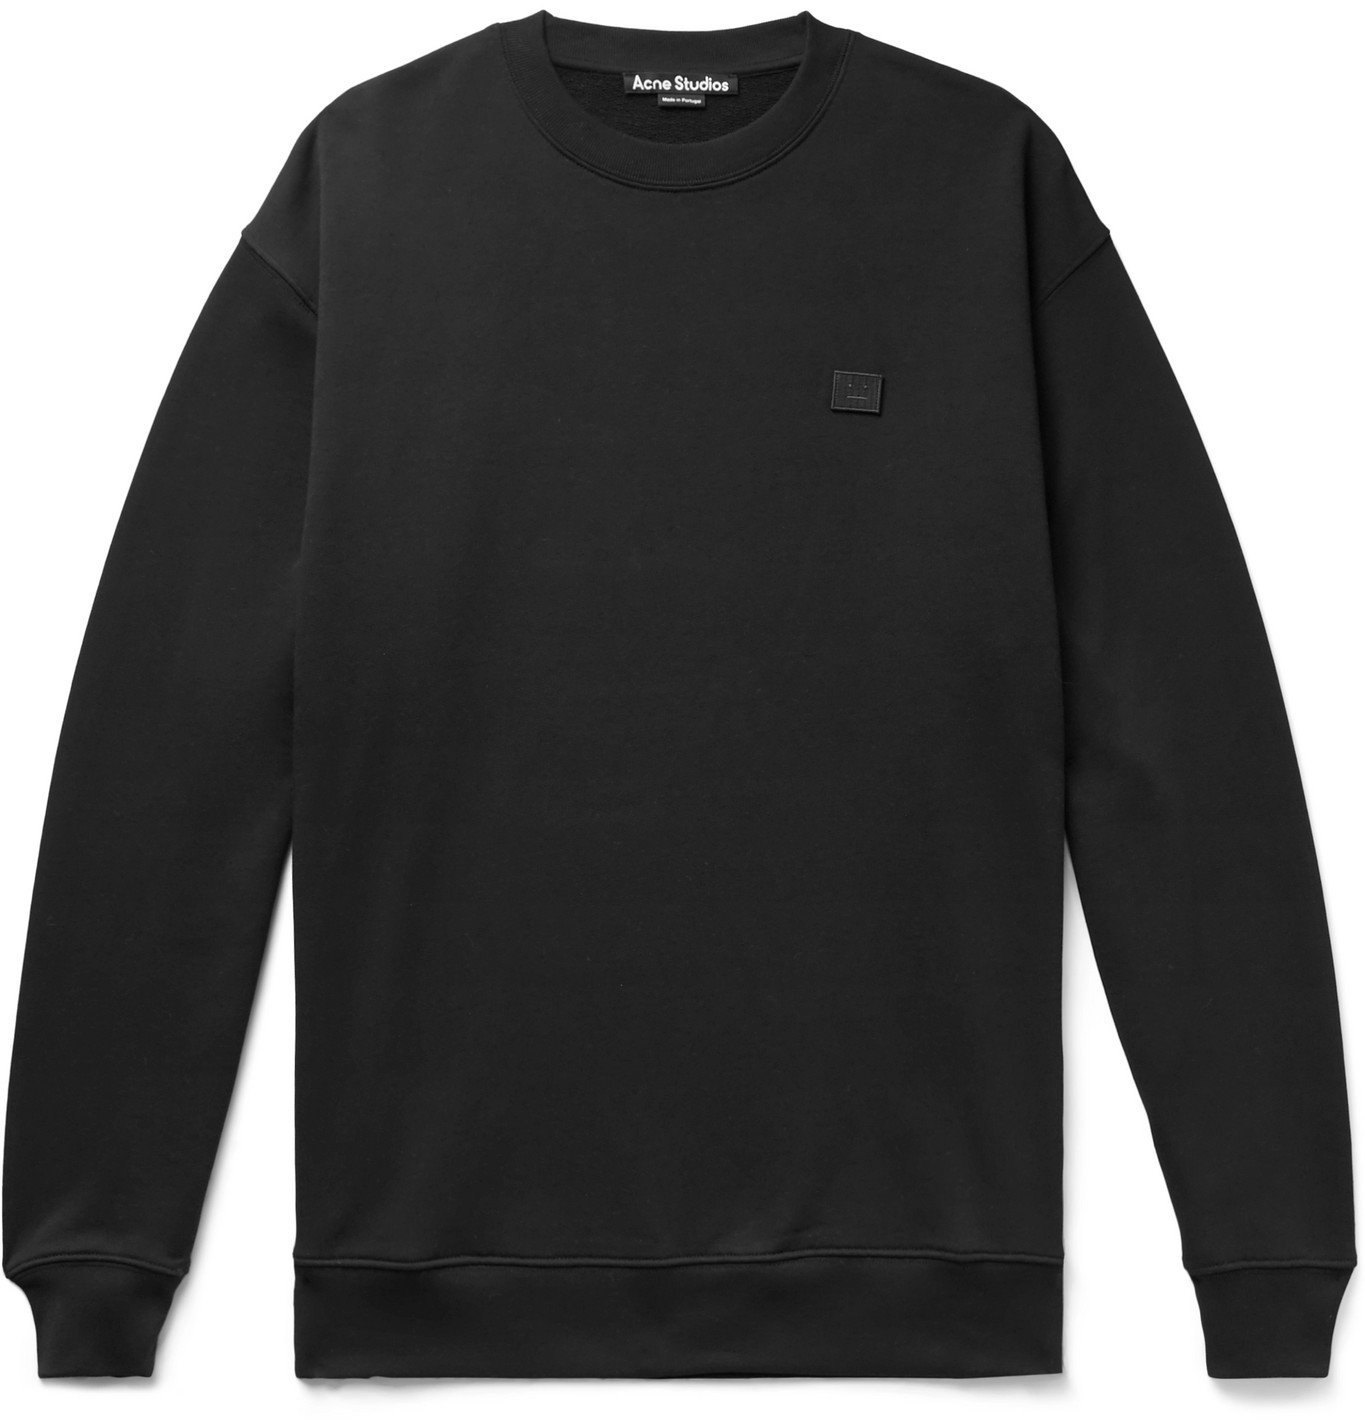 Acne Studios - Forba Oversized Logo-Appliquéd Loopback Cotton-Jersey Sweatshirt - Black